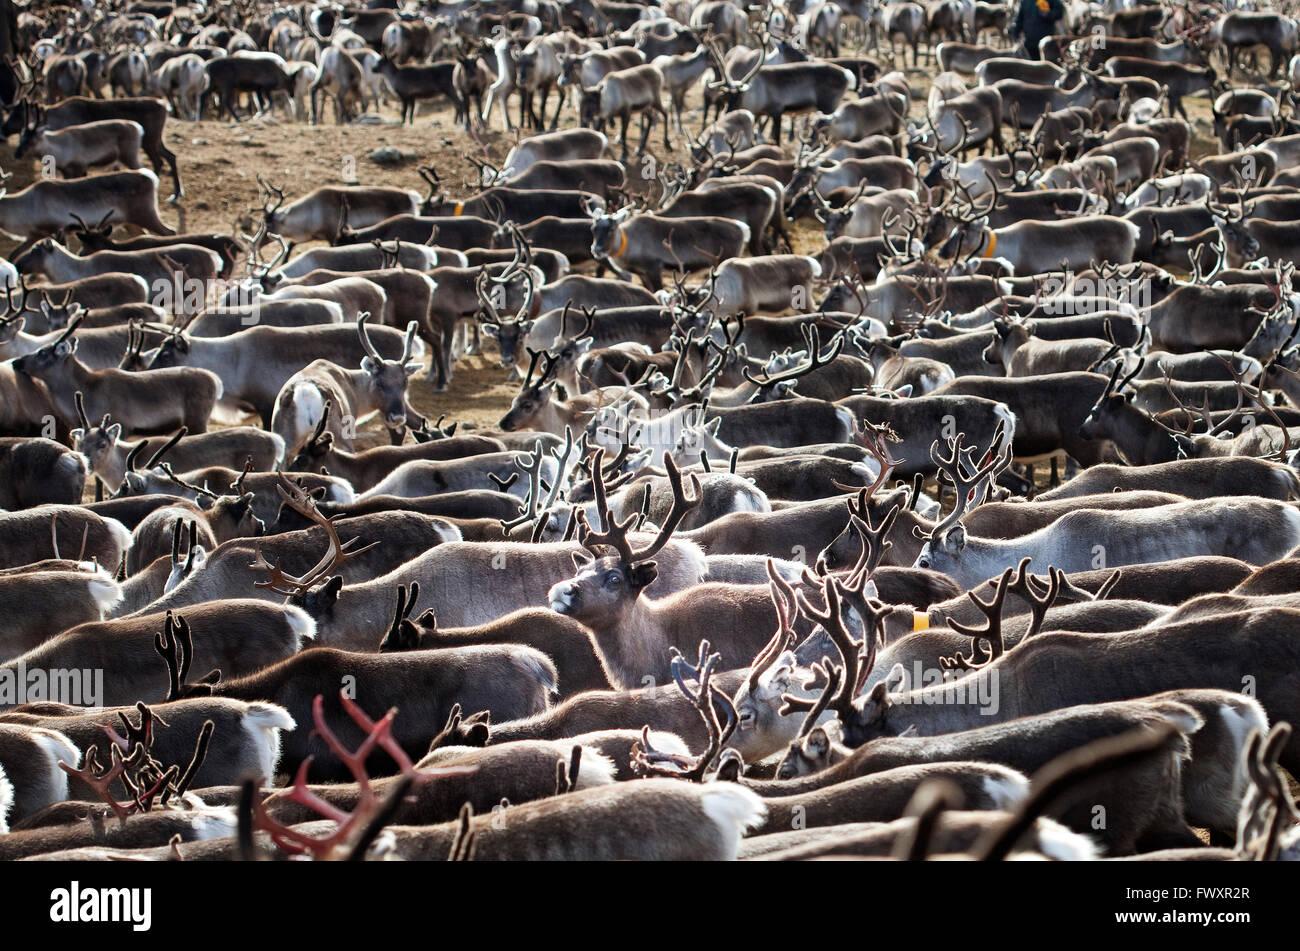 Sweden, Lapland, Levas, Herd of reindeer (Rangifer tarandus) in autumn - Stock Image